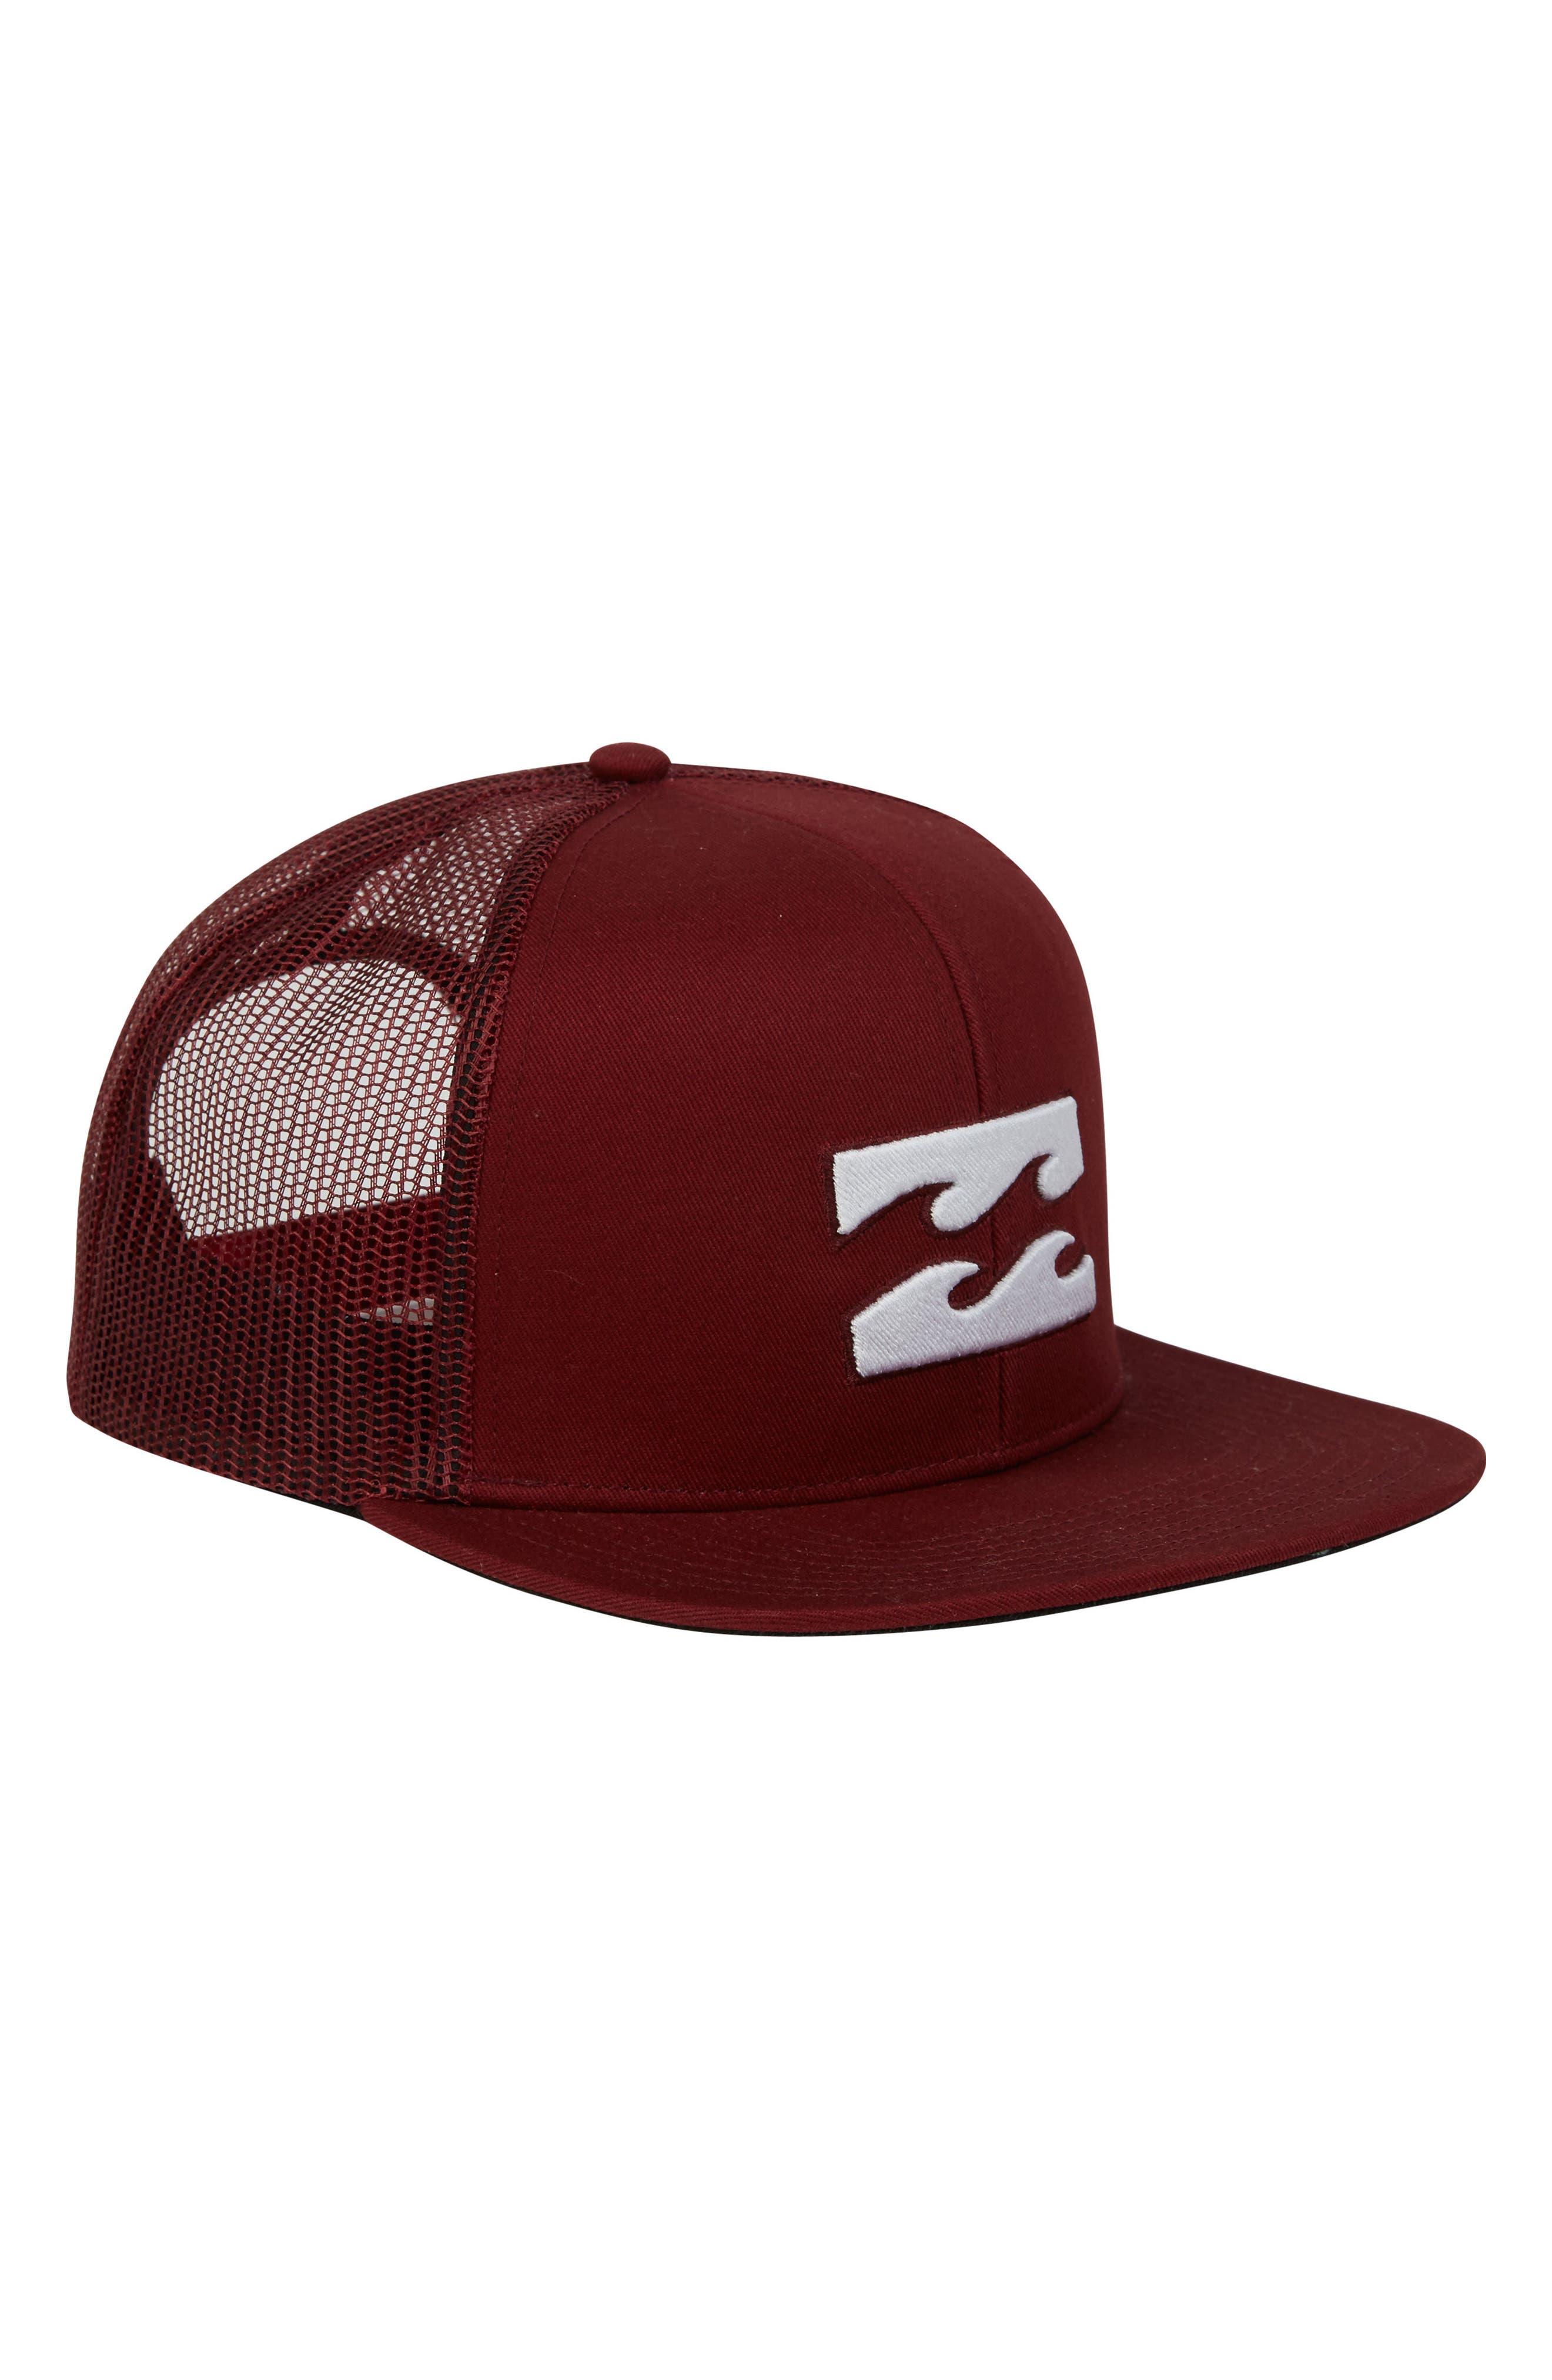 Main Image - Billabong All Day Trucker Hat